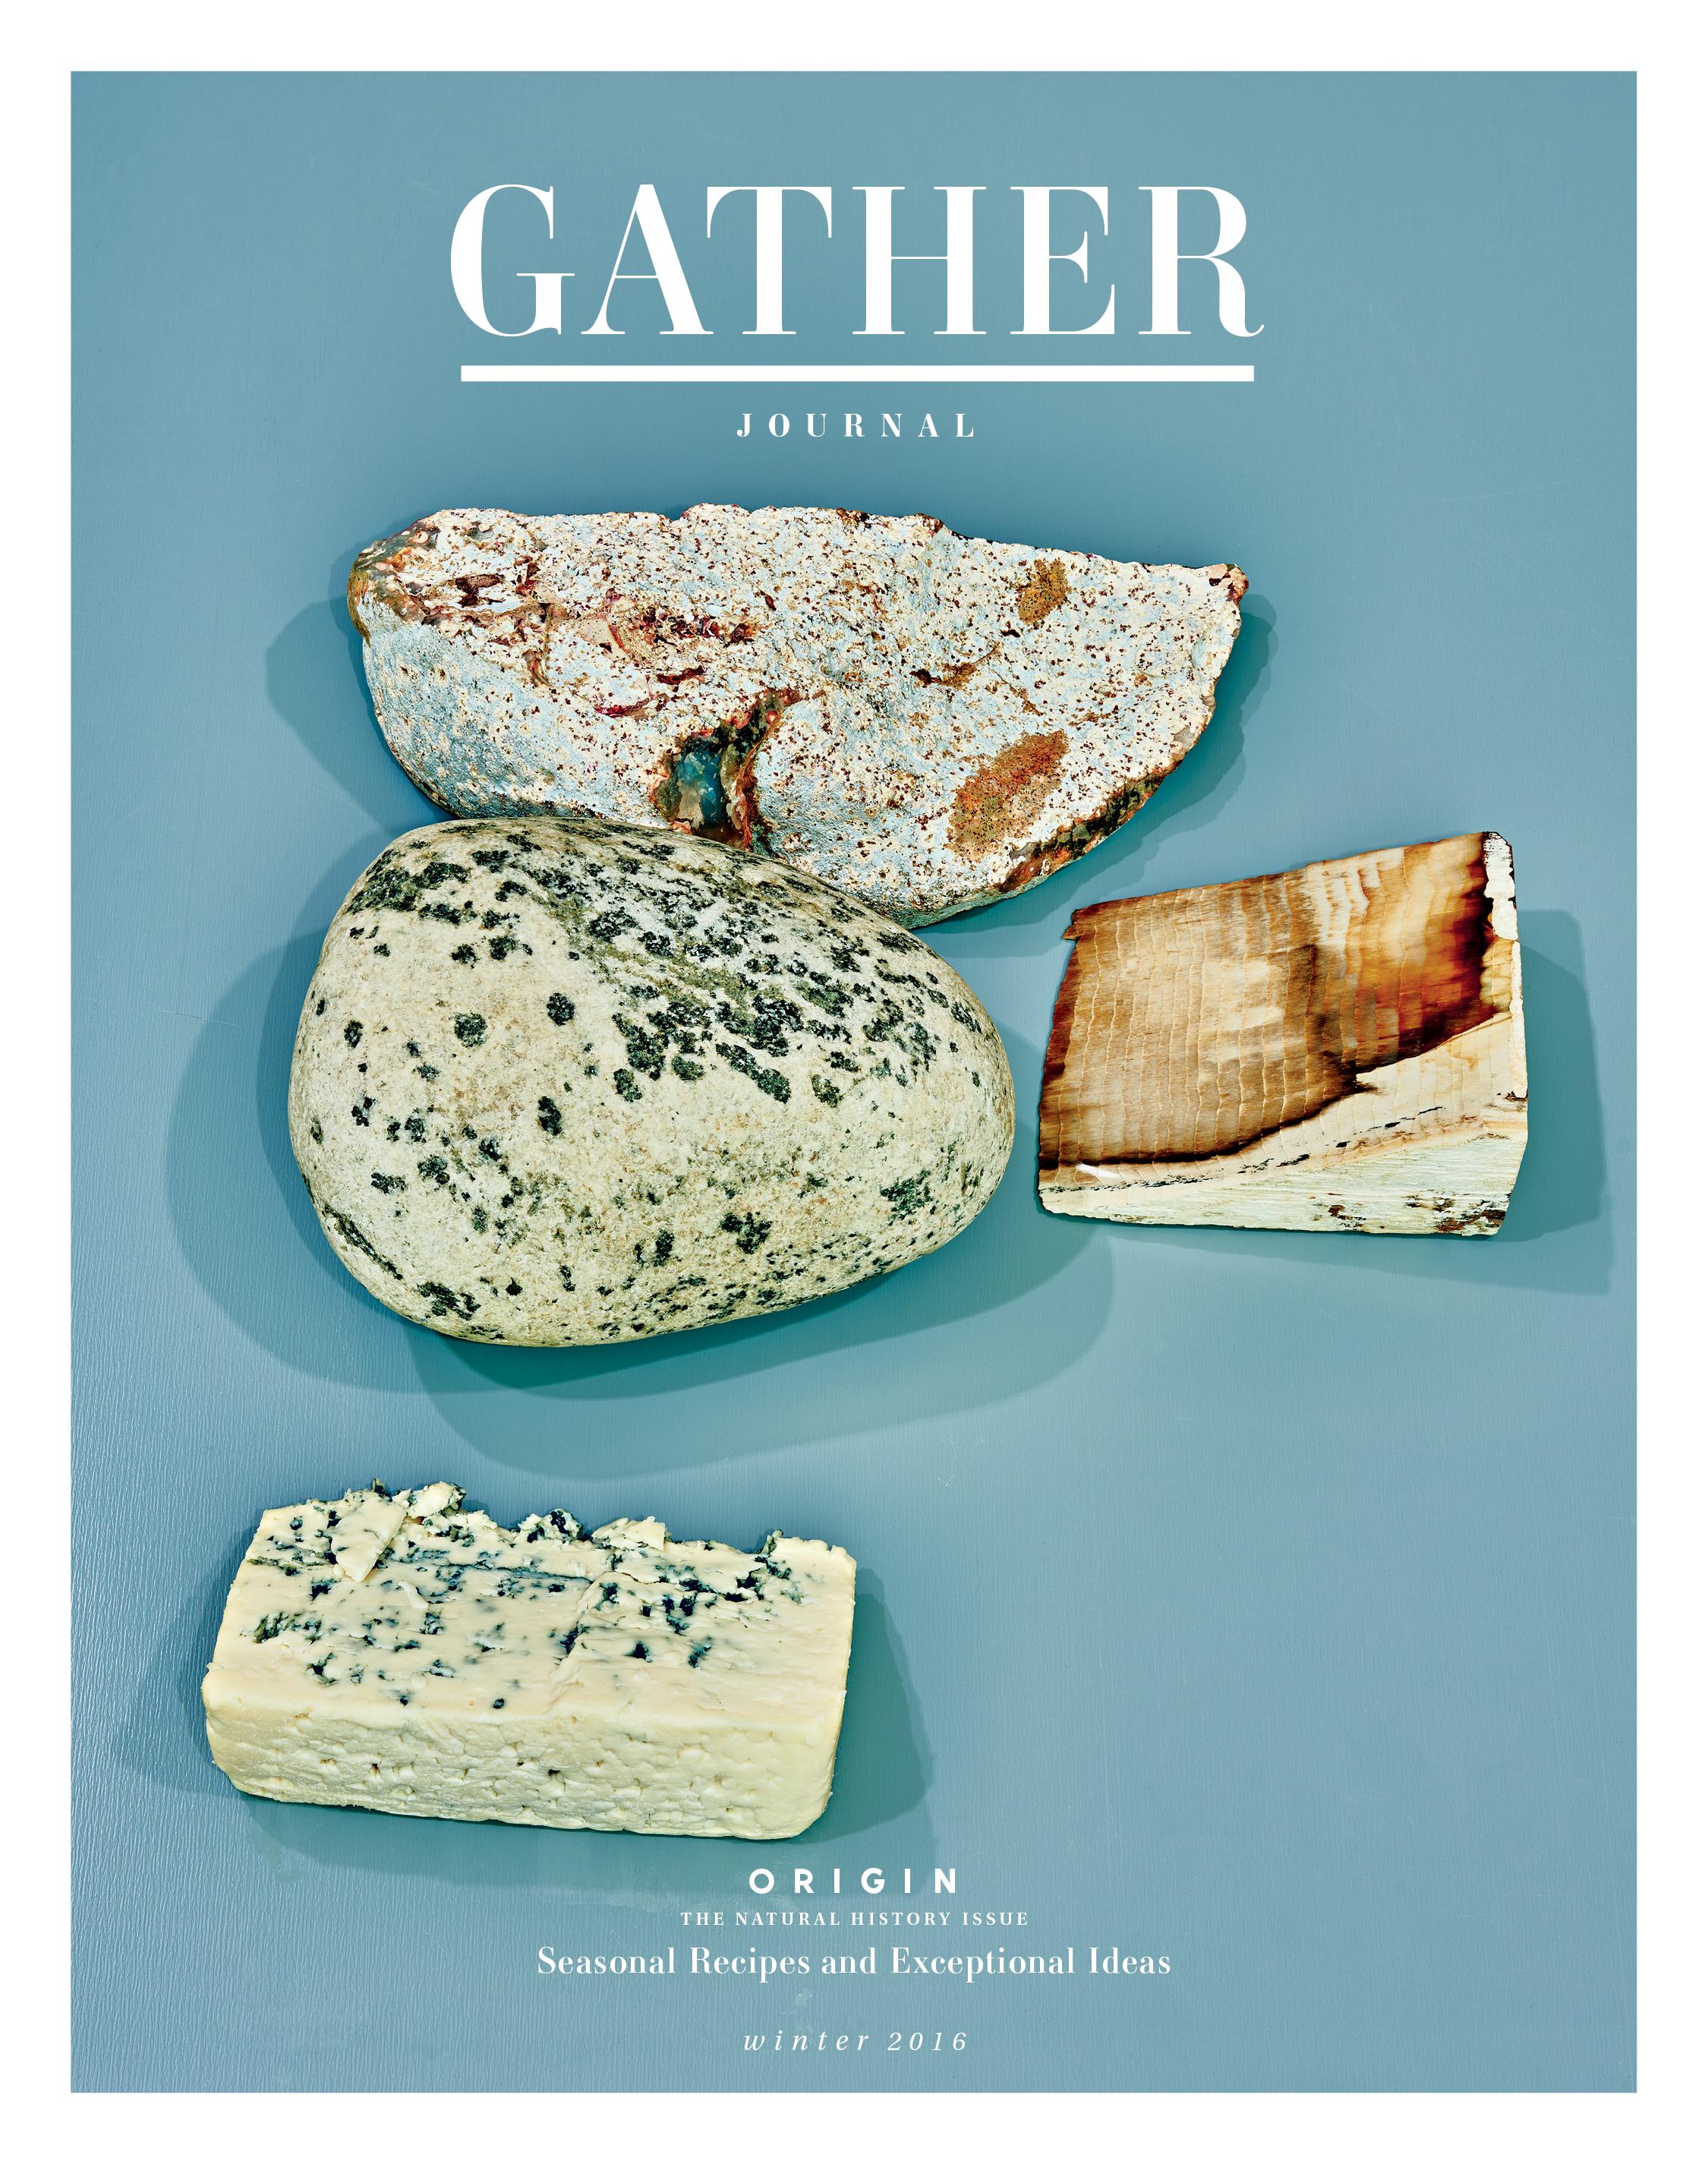 GatherJournal_W16_COVER_HIRES copy.jpg